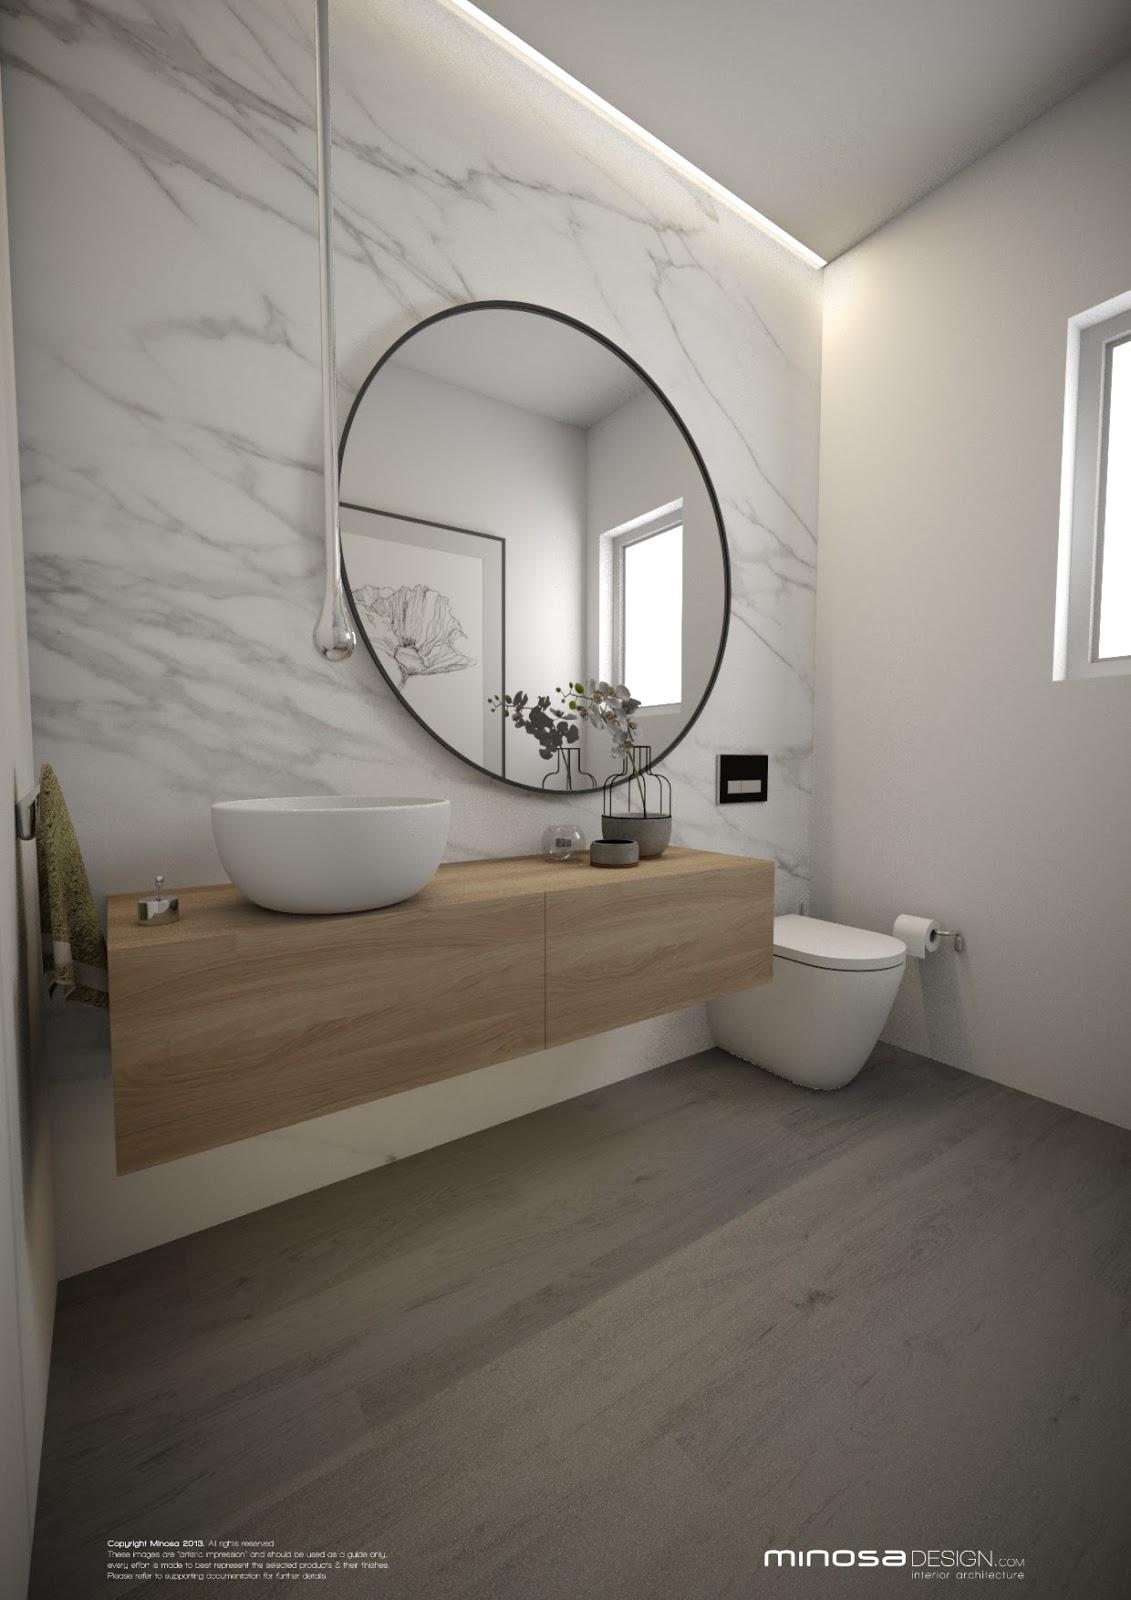 Minosa Powder Room  The WOW bathroom